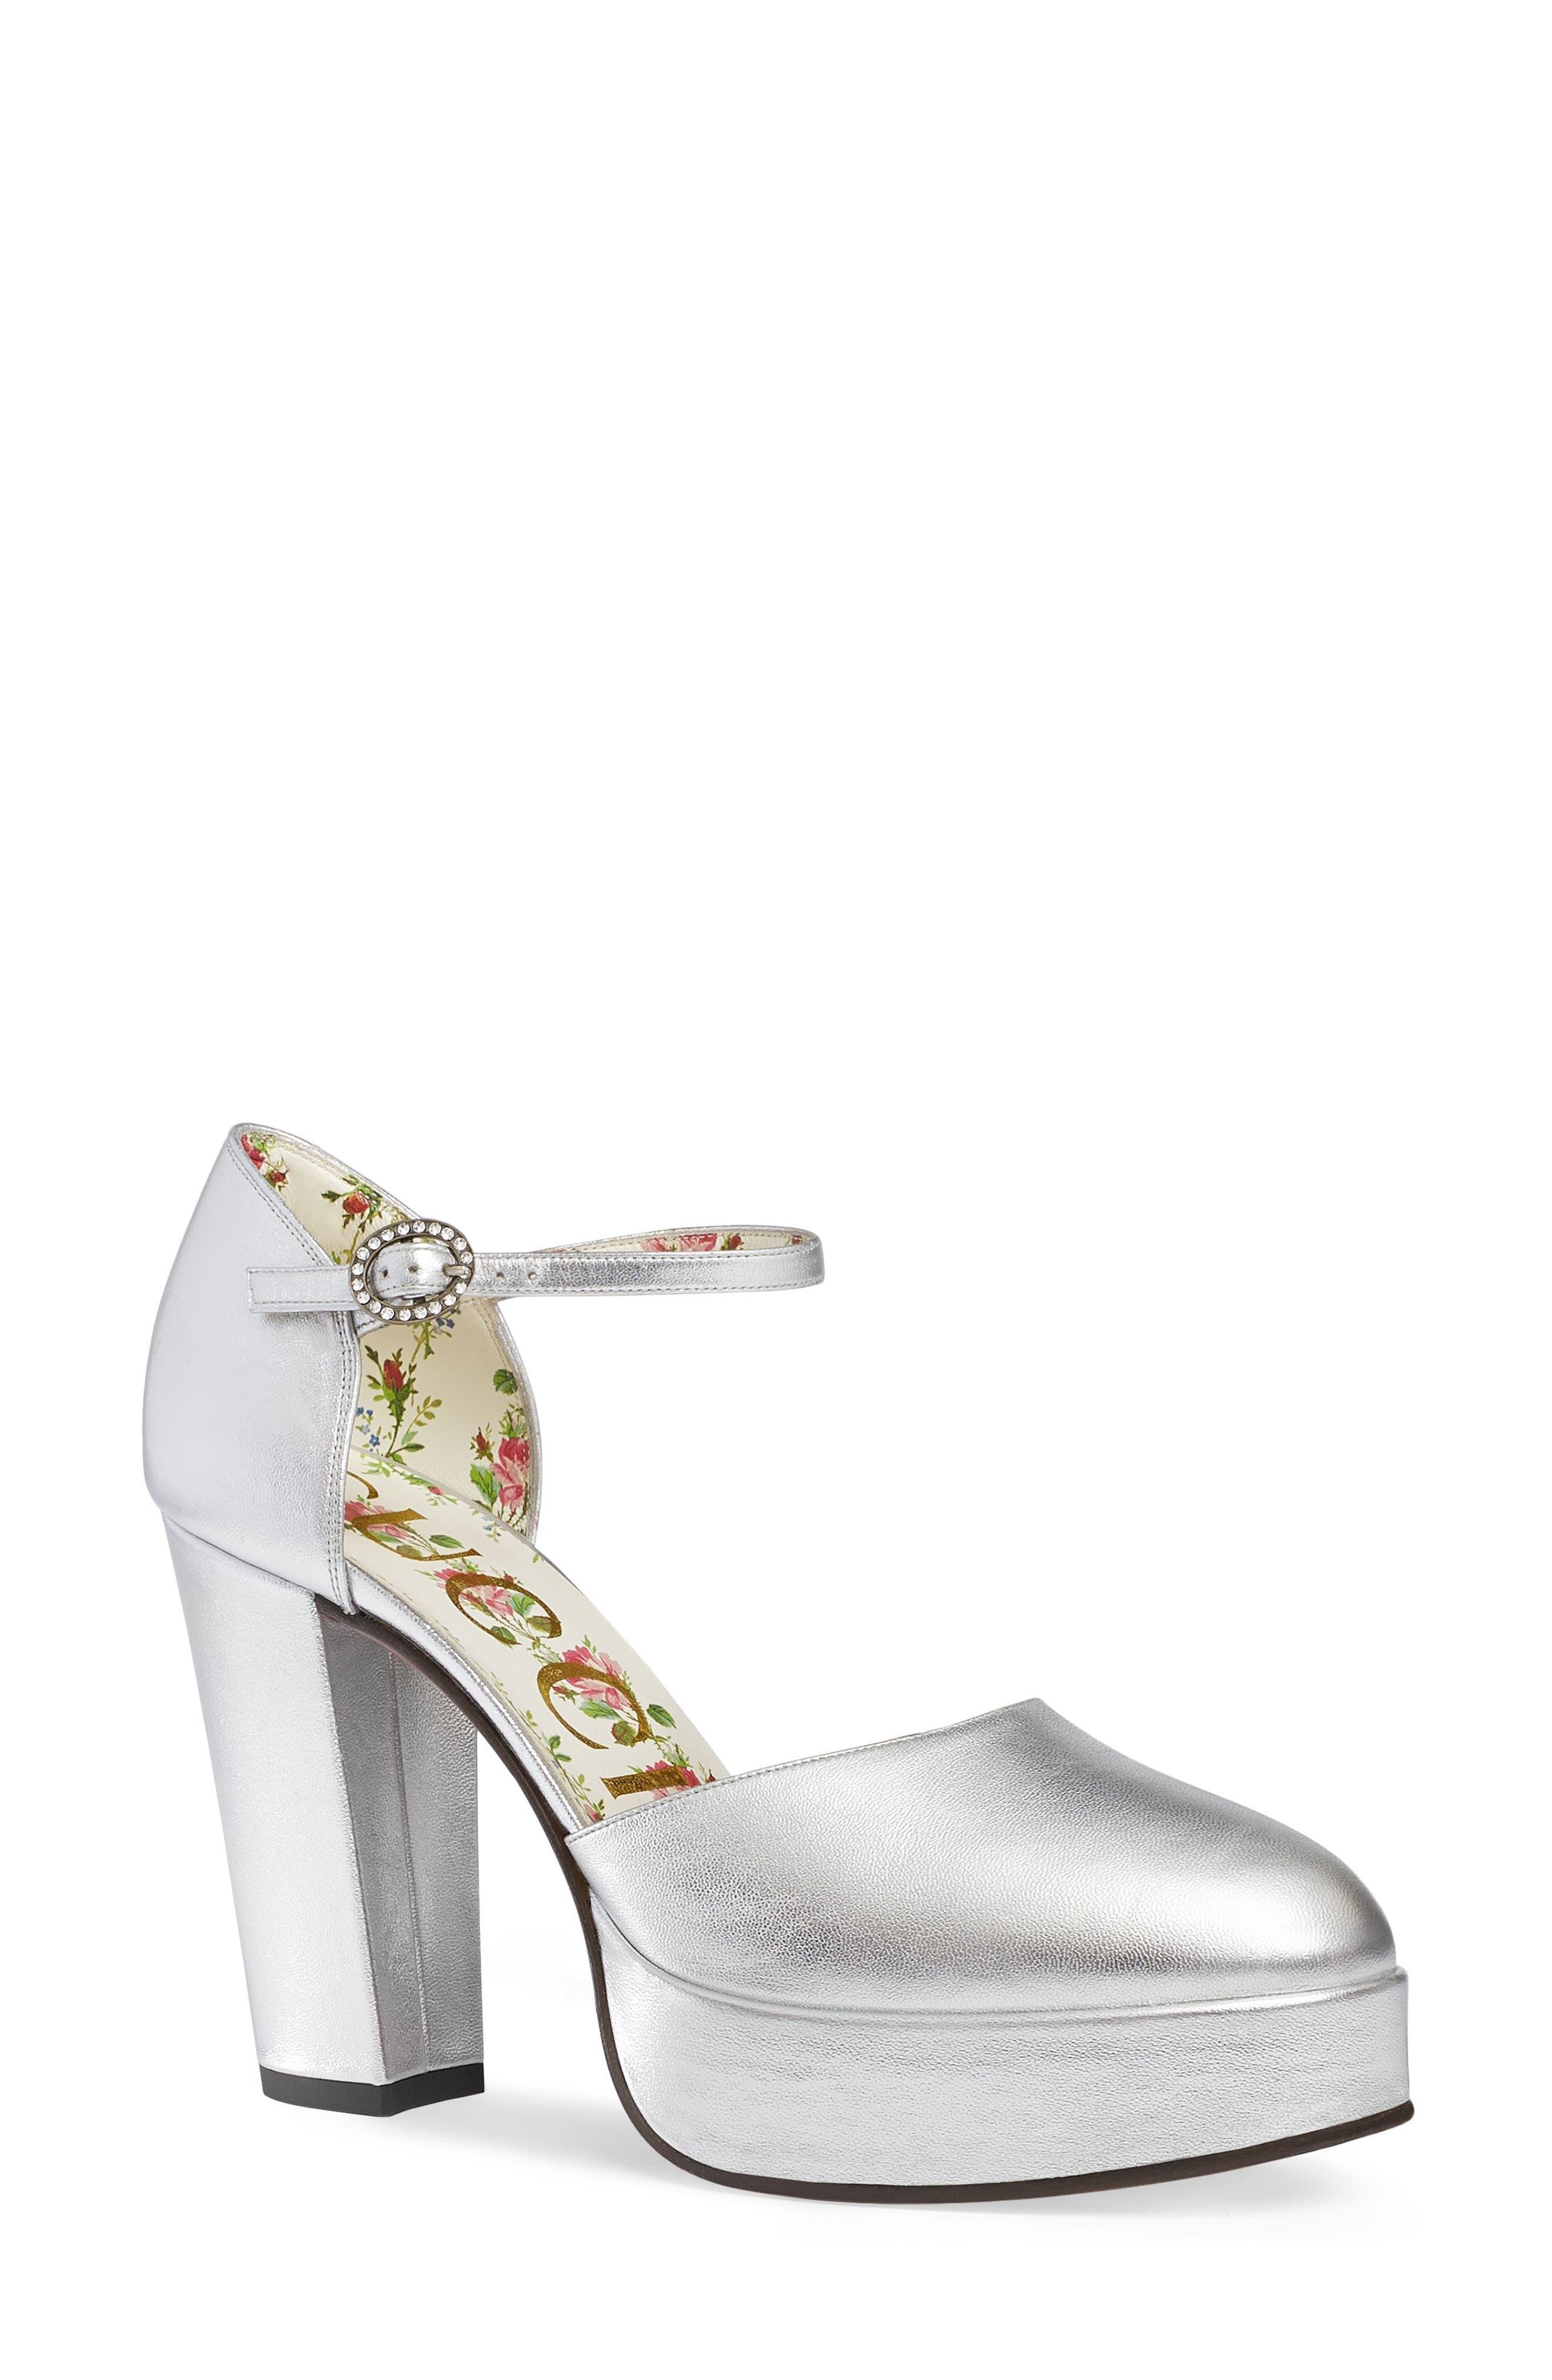 Alternate Image 1 Selected - Gucci Agon Ankle Strap Platform Pump (Women)